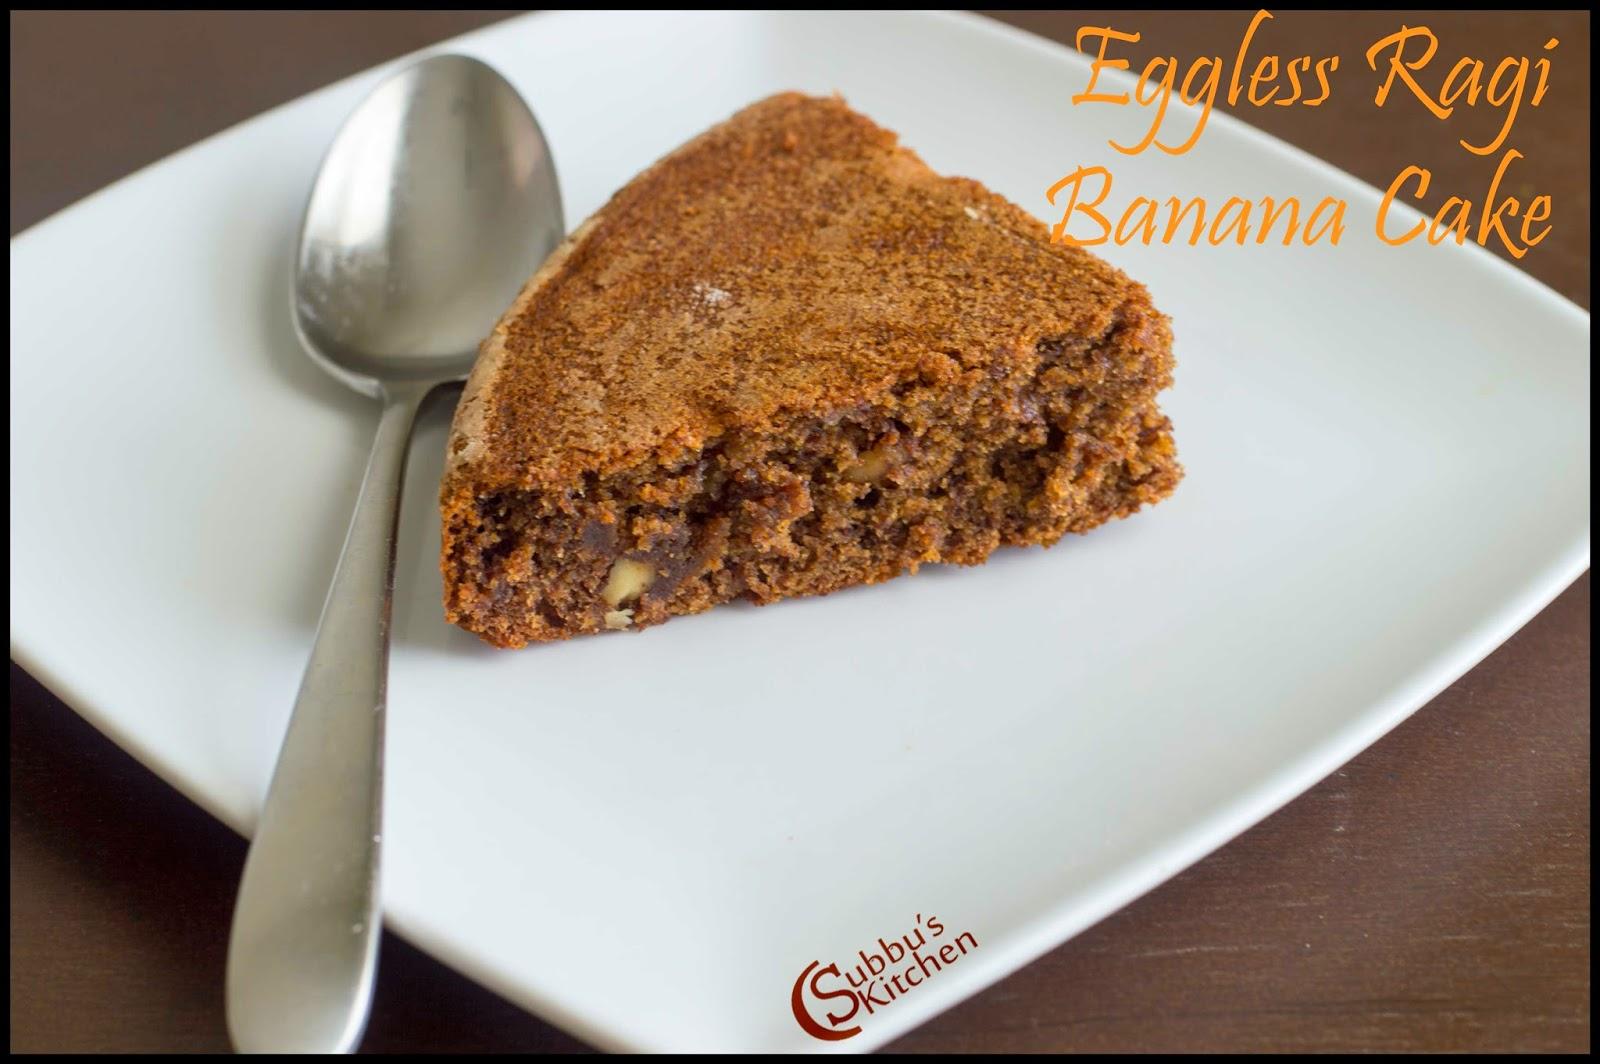 Pressure Cooker Eggless Ragi Banana Cake Recipe